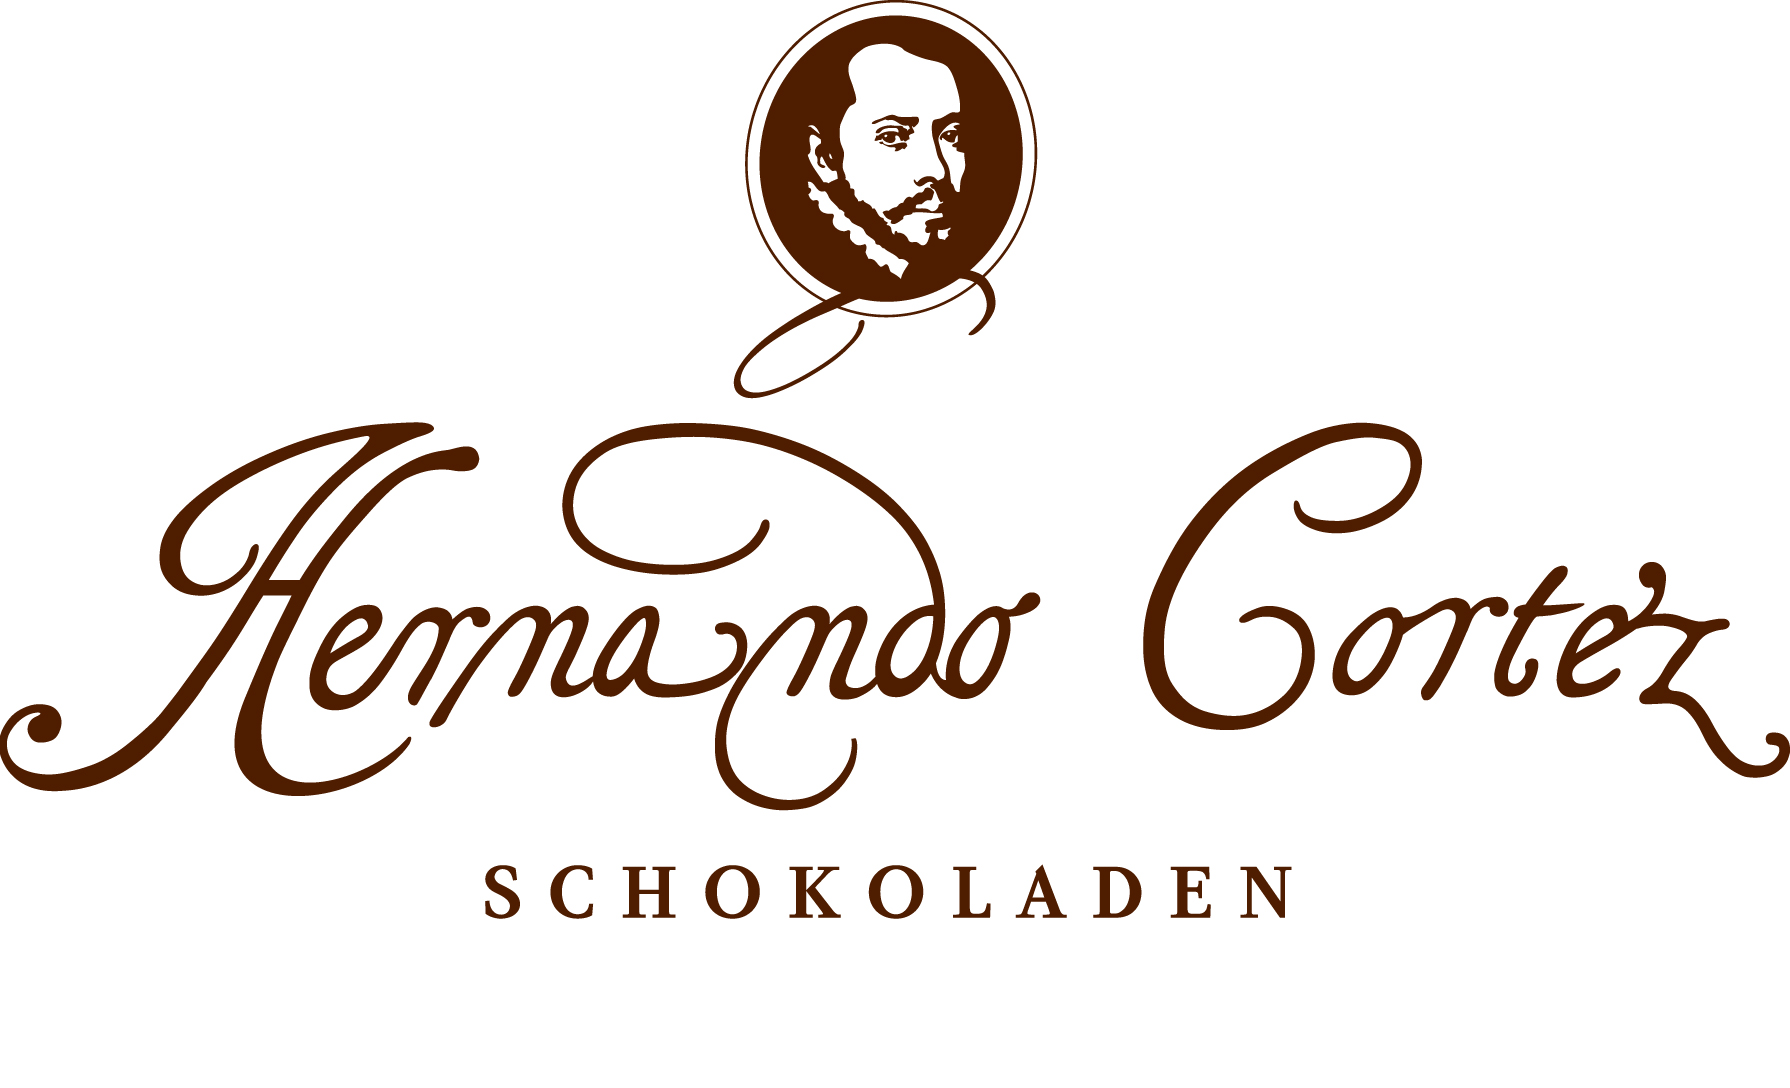 Hernando Cortez Schokoladen